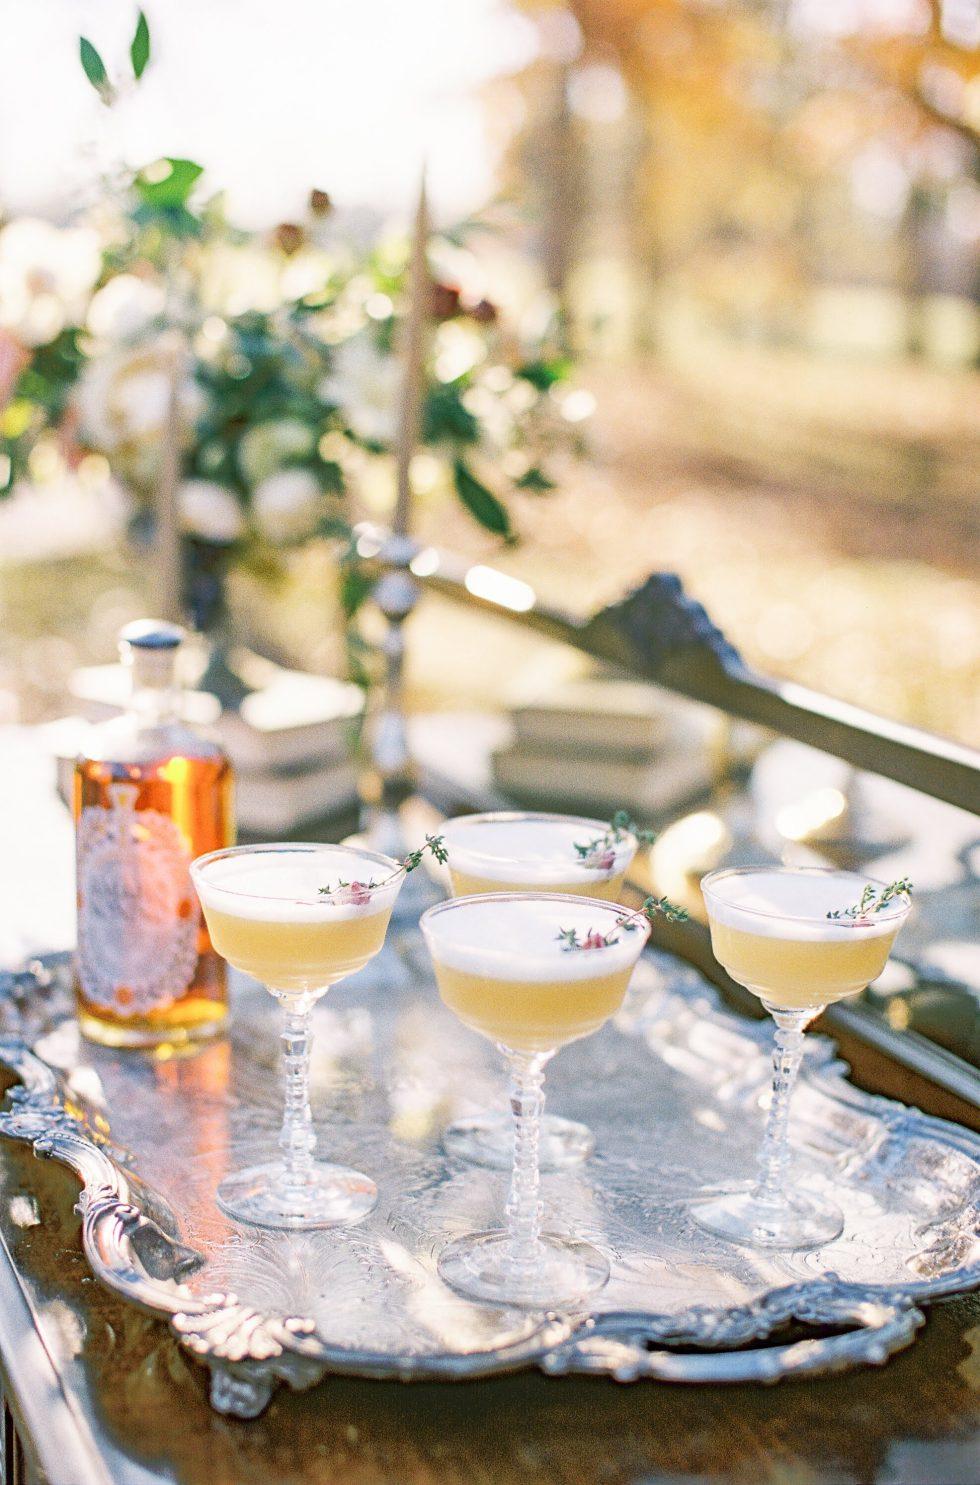 Summerfield-Farms-Outdoor-Fall-Wedding021